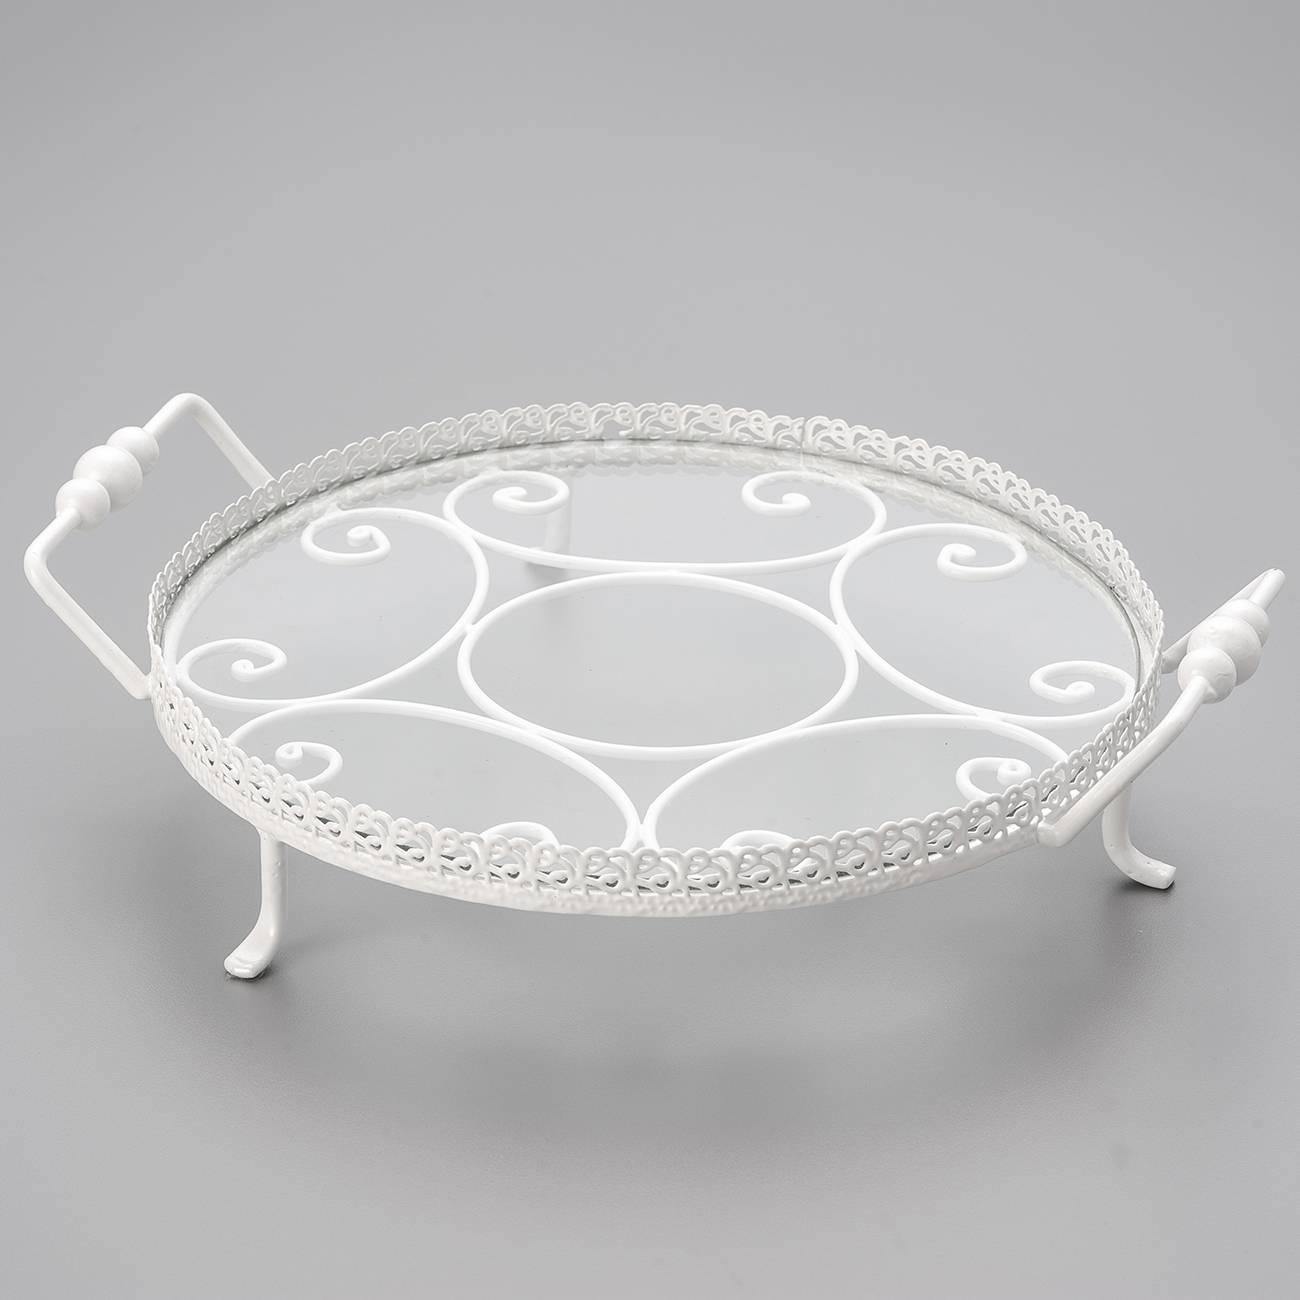 Bandeja Spiron Branca Grande em Metal - Bon Gourmet - 35,5 cm